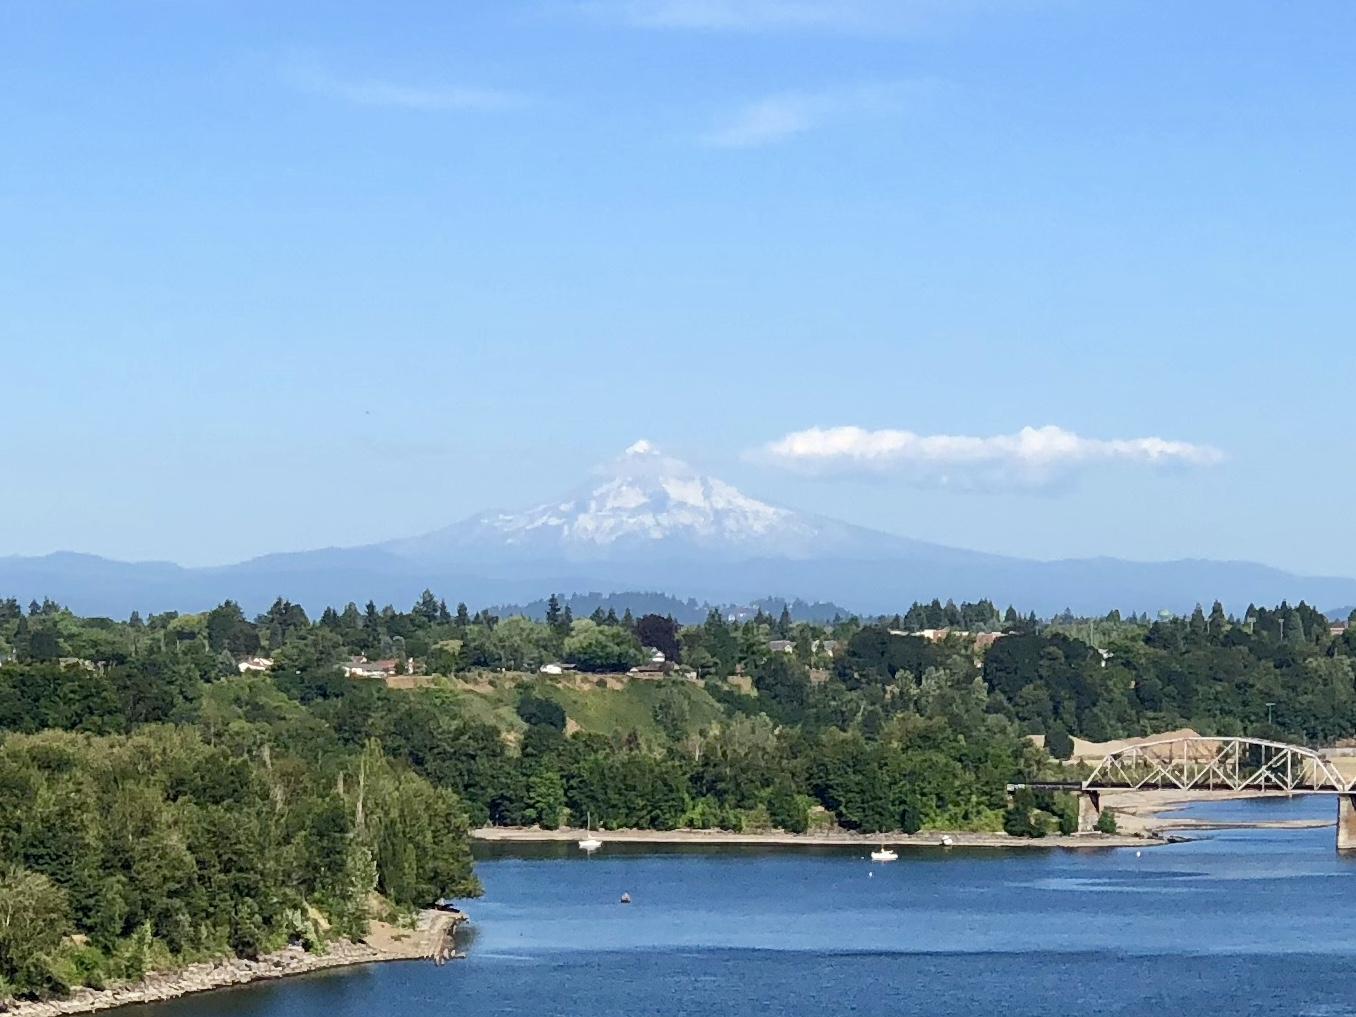 Mt. Hood looms in the distance off the Saint John's bridge across the Willamette River.